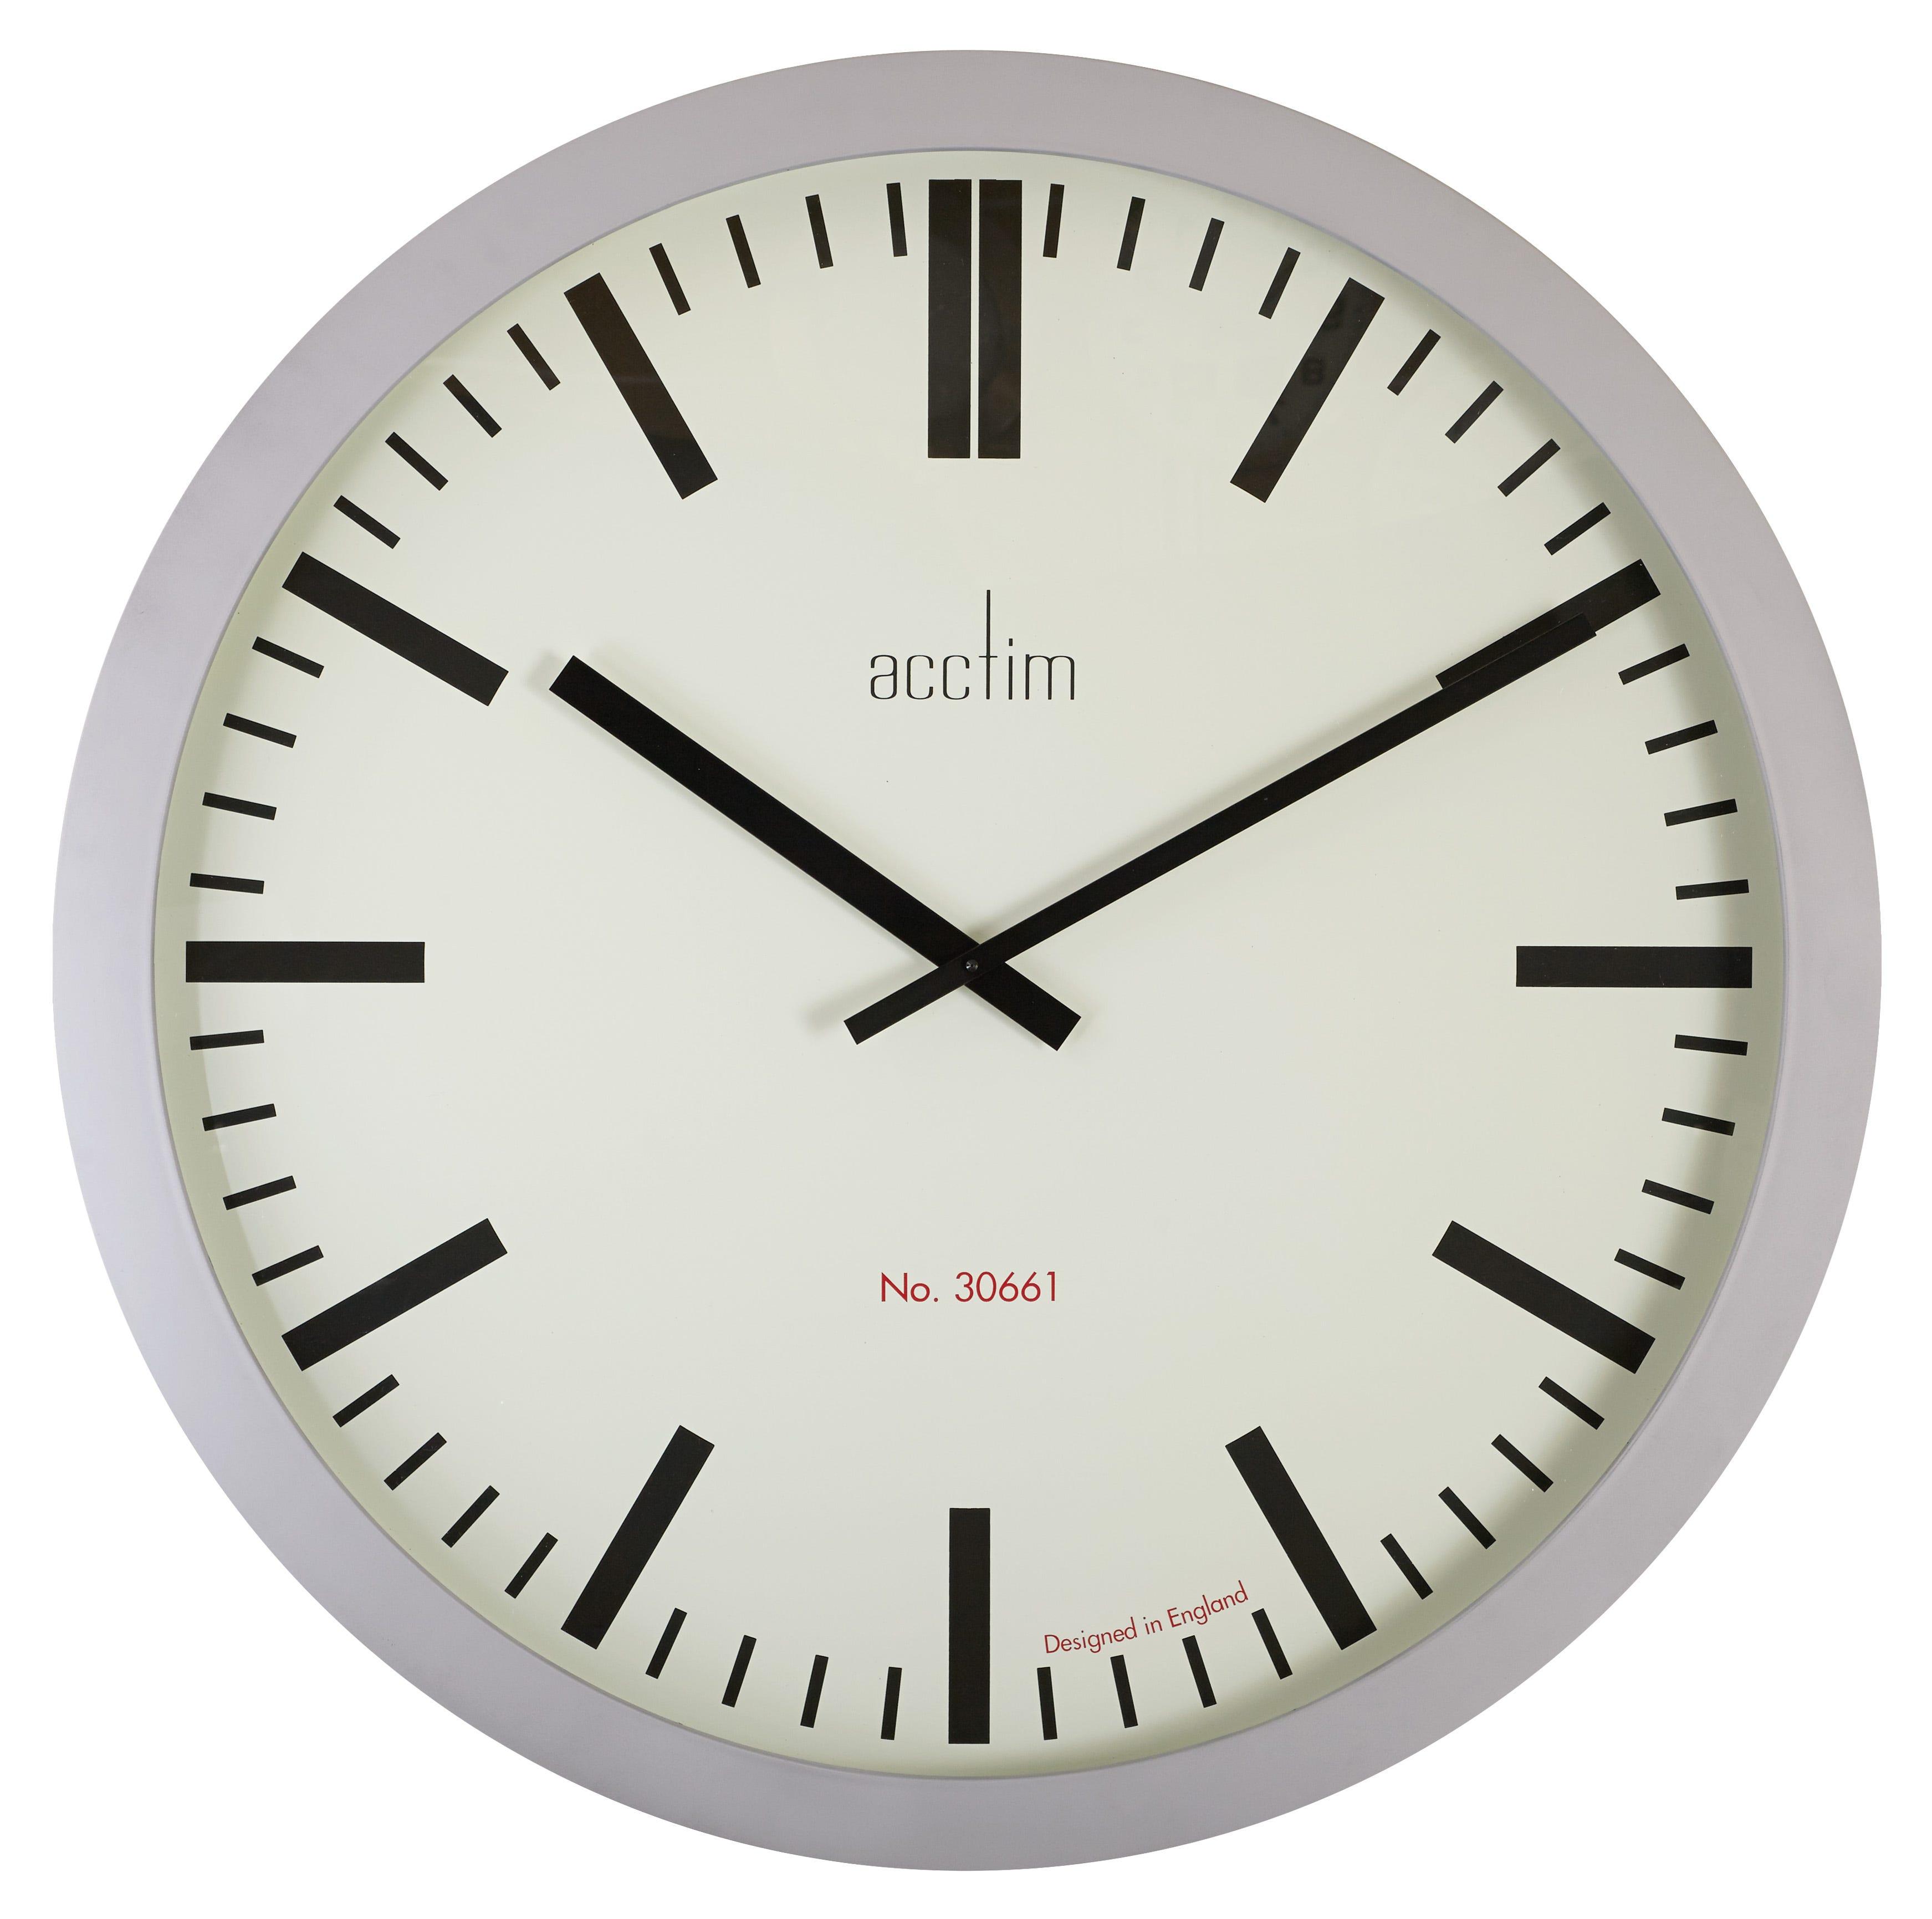 Acctim maldon mini alarm clock black price enligo acctim monument 90cm silver baton dial wall clock amipublicfo Choice Image